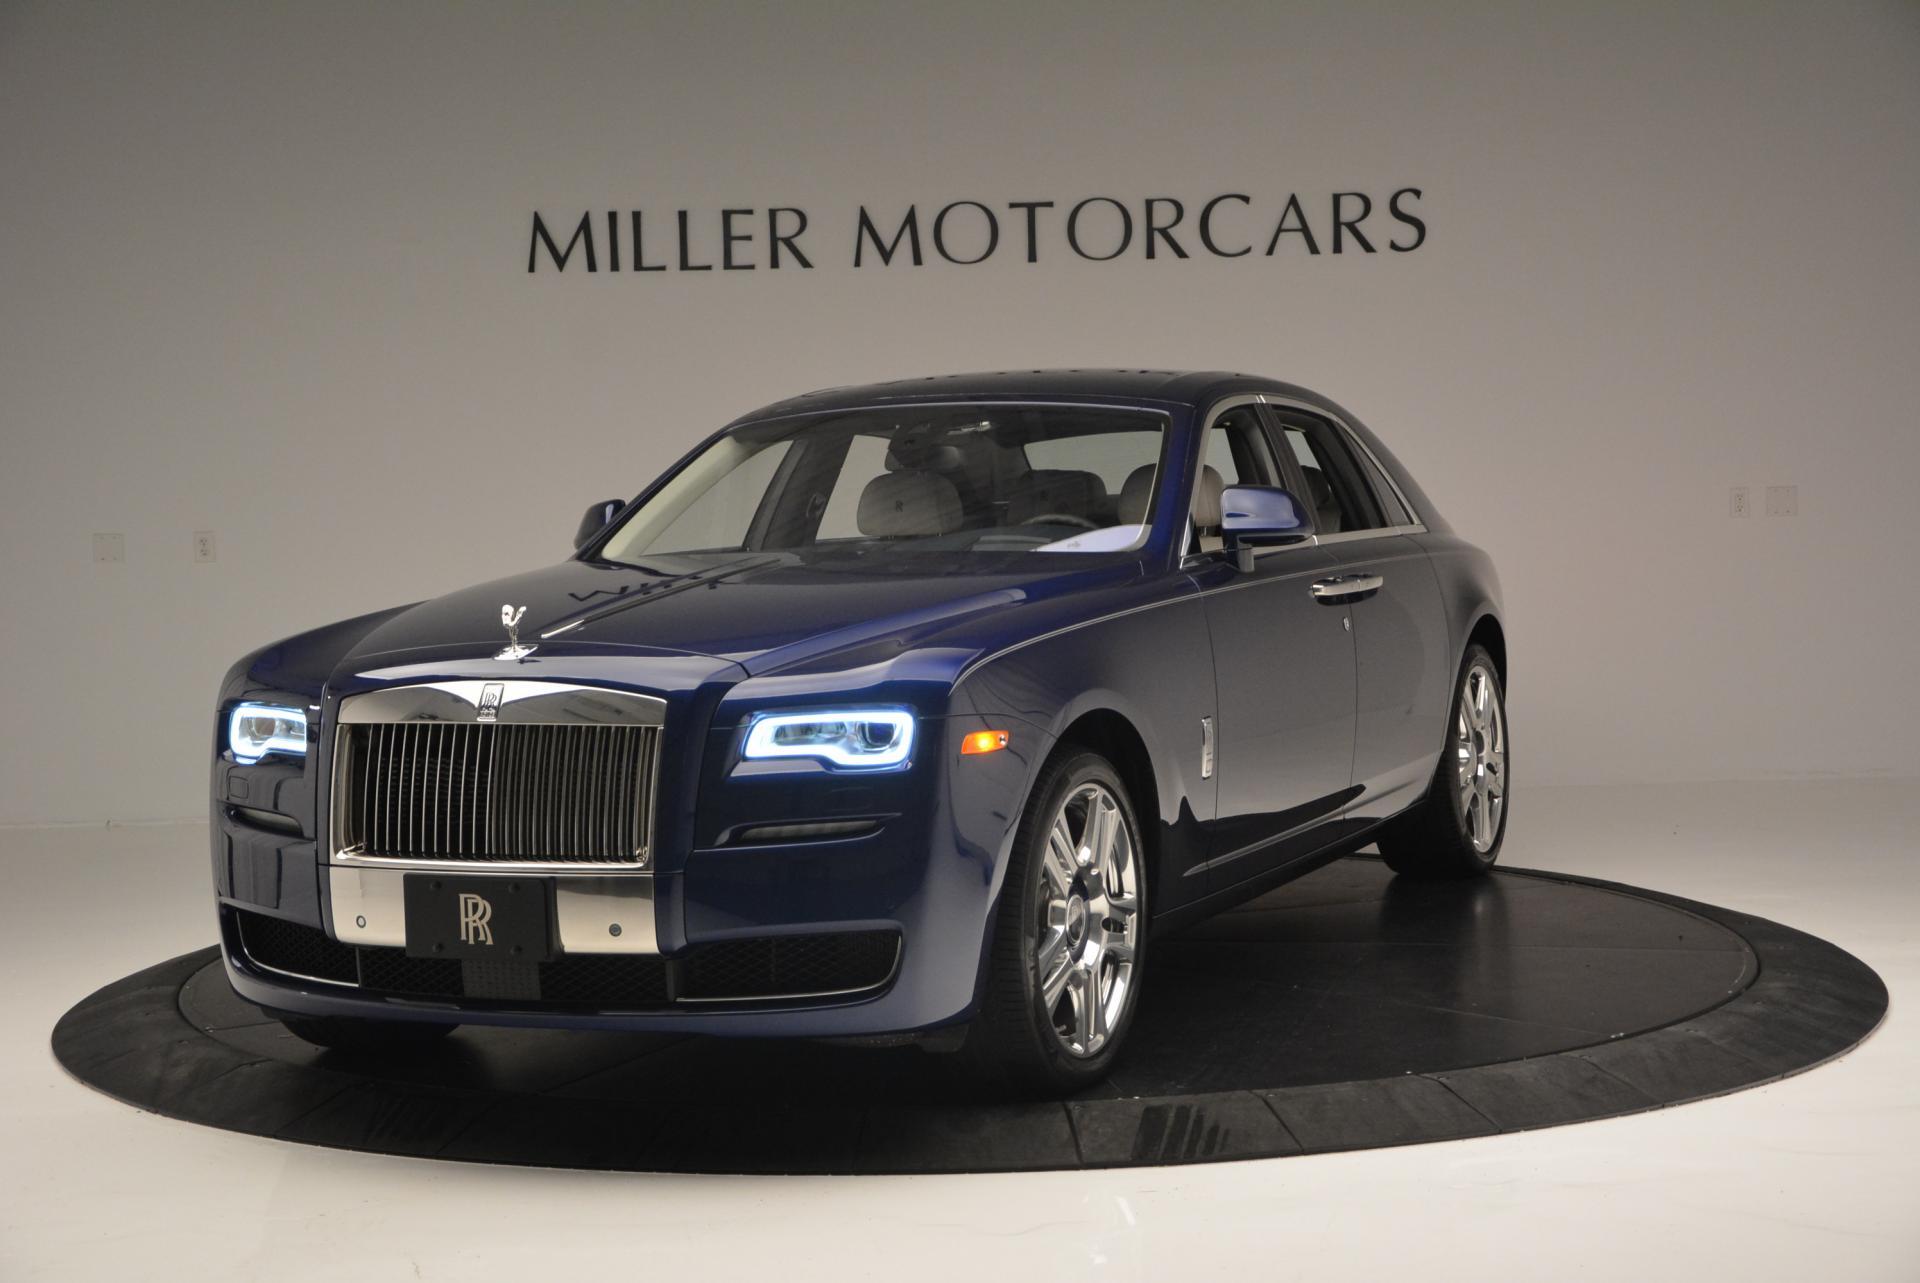 New 2016 Rolls-Royce Ghost Series II for sale Sold at McLaren Greenwich in Greenwich CT 06830 1